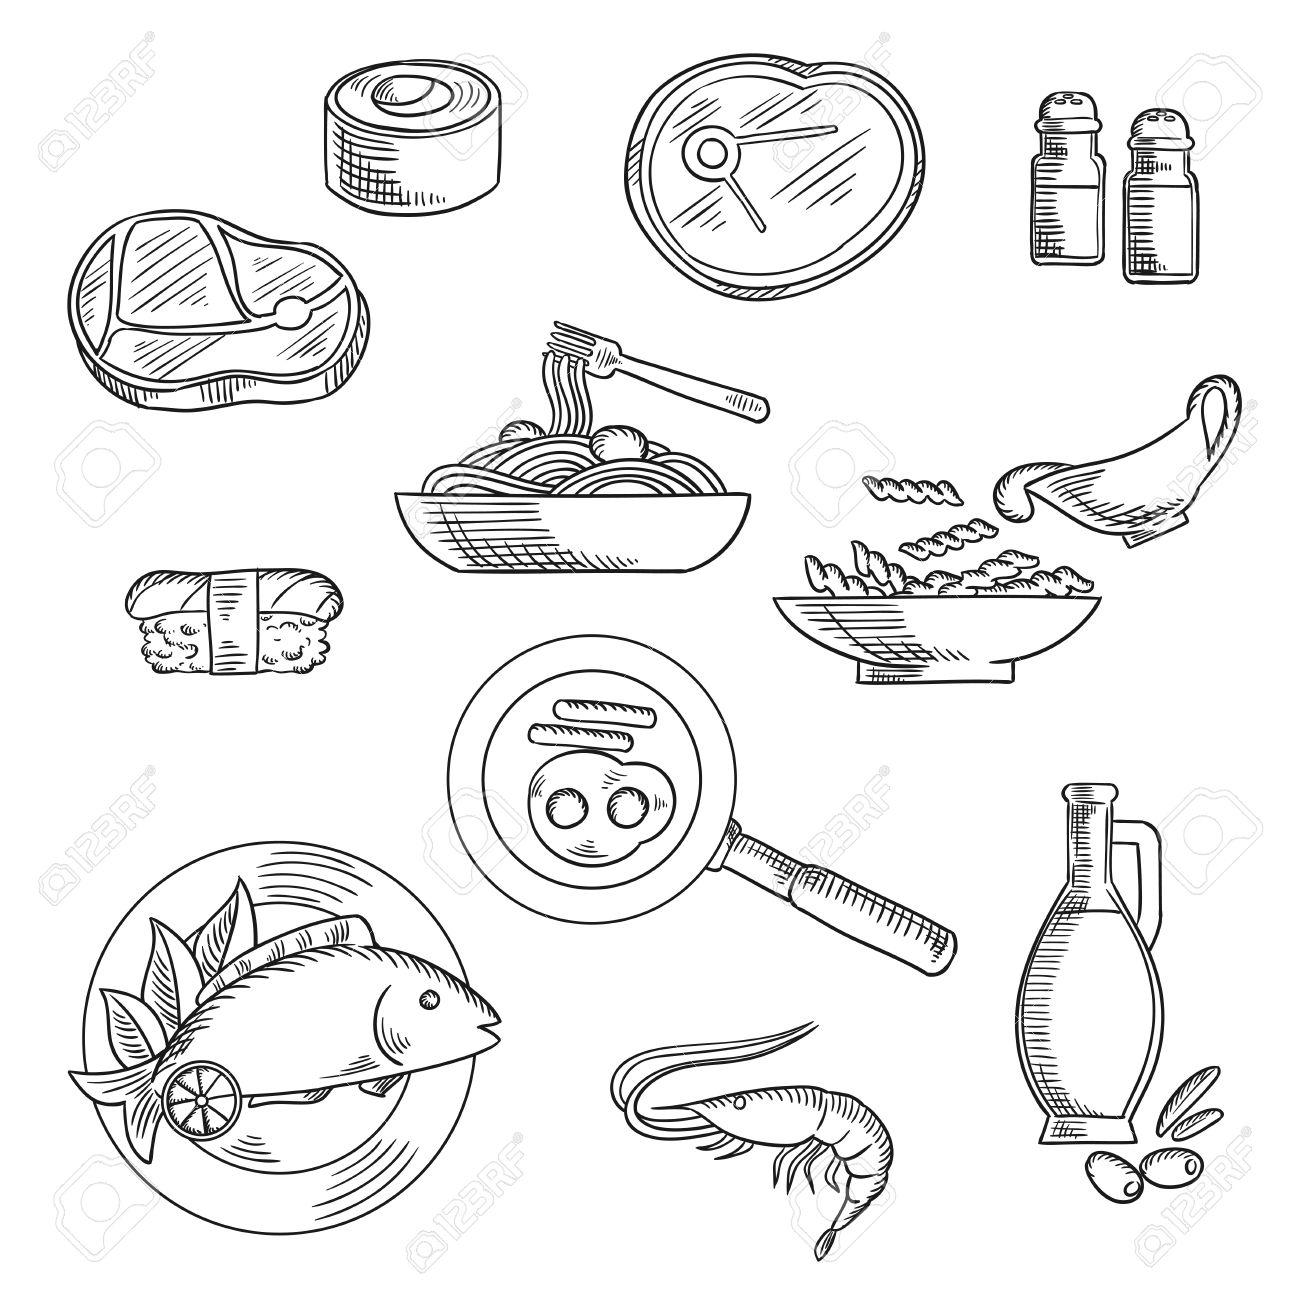 1300x1300 Healthy Food Sketch Icons Of Sushi Roll Nigiri, Pasta